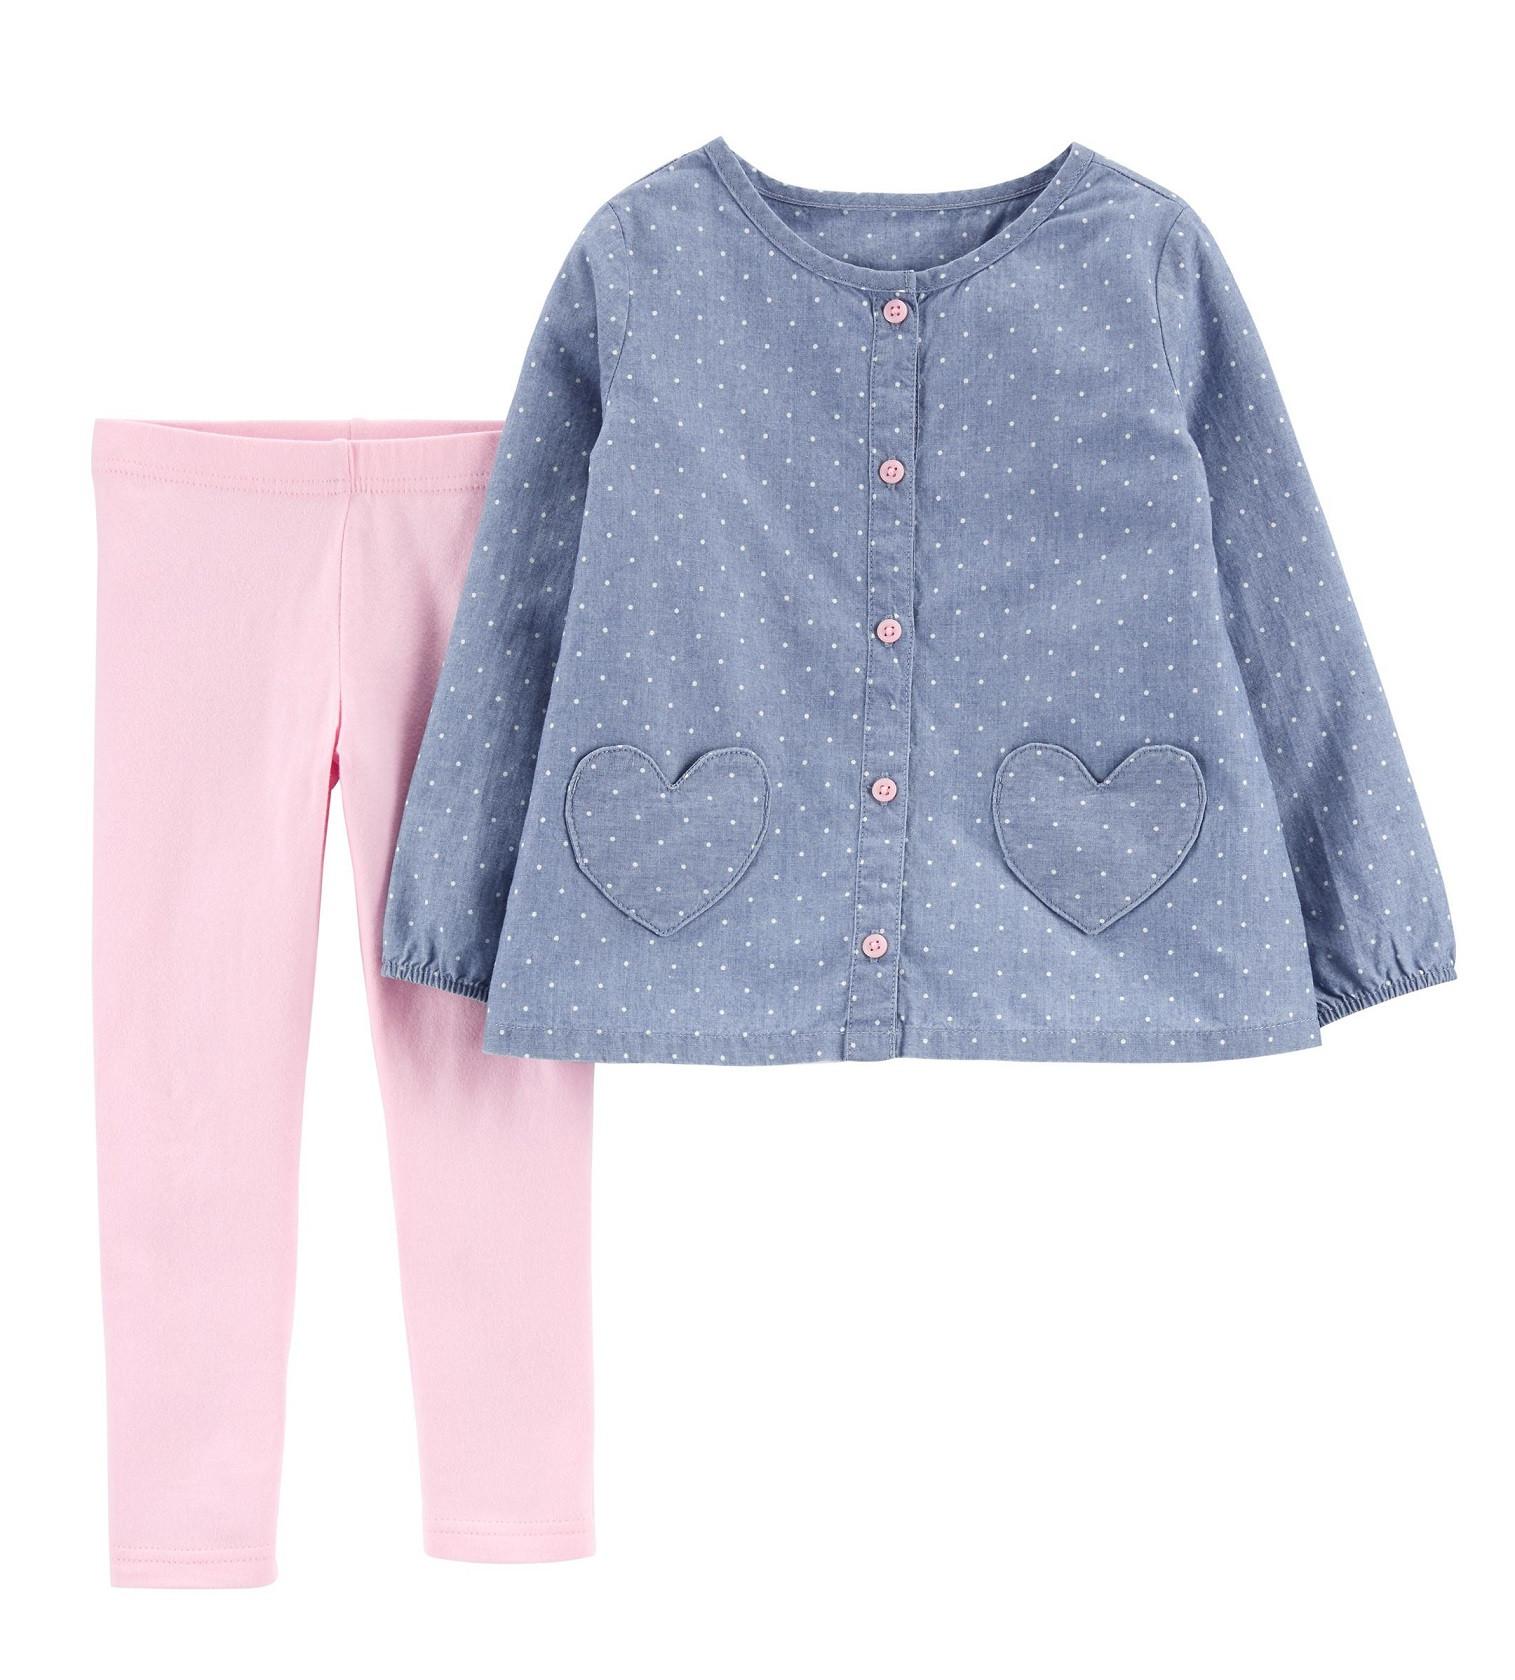 Купити Набір Carters Heart Chambray Blue/Pink - фото 1